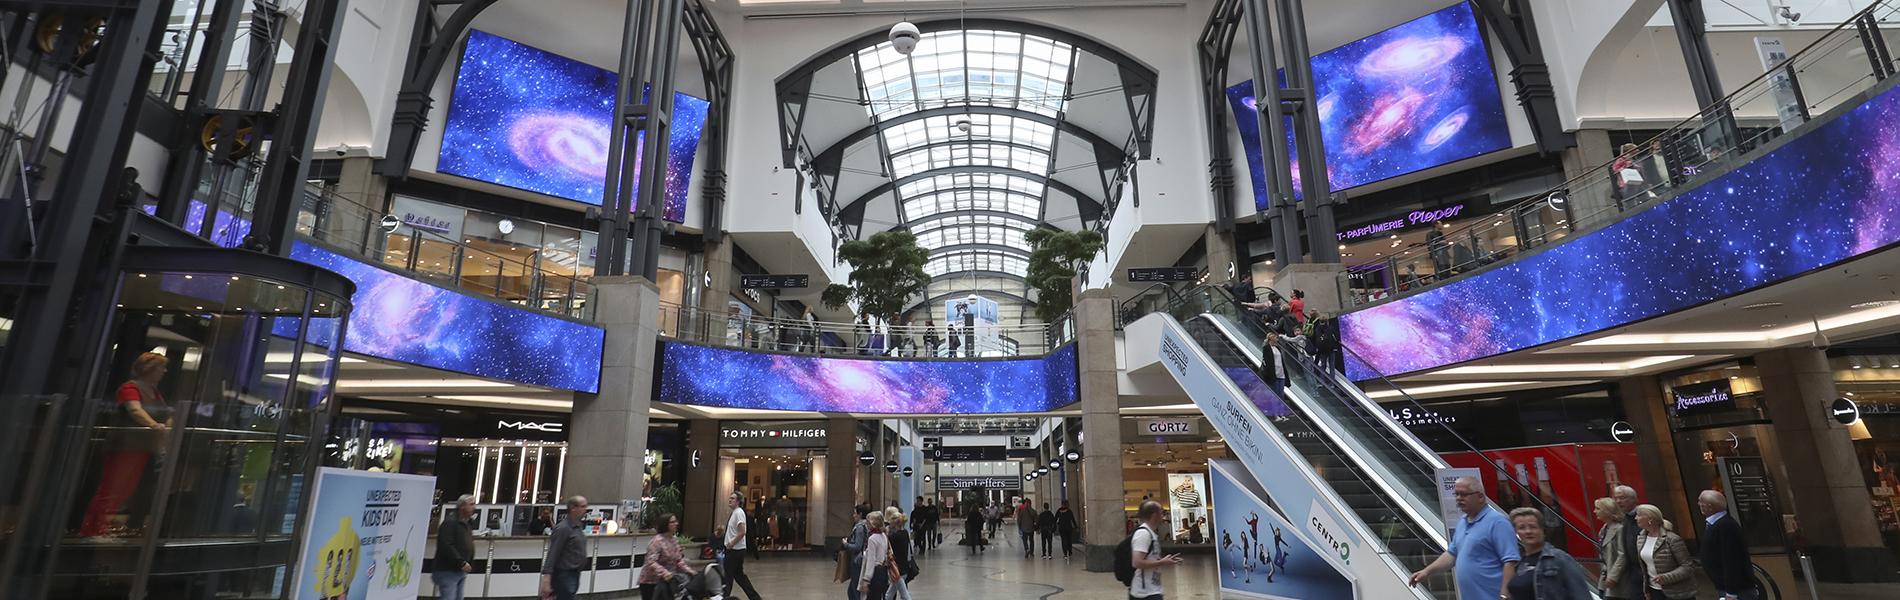 Mall Media S Led Future Is Bright Daktronics